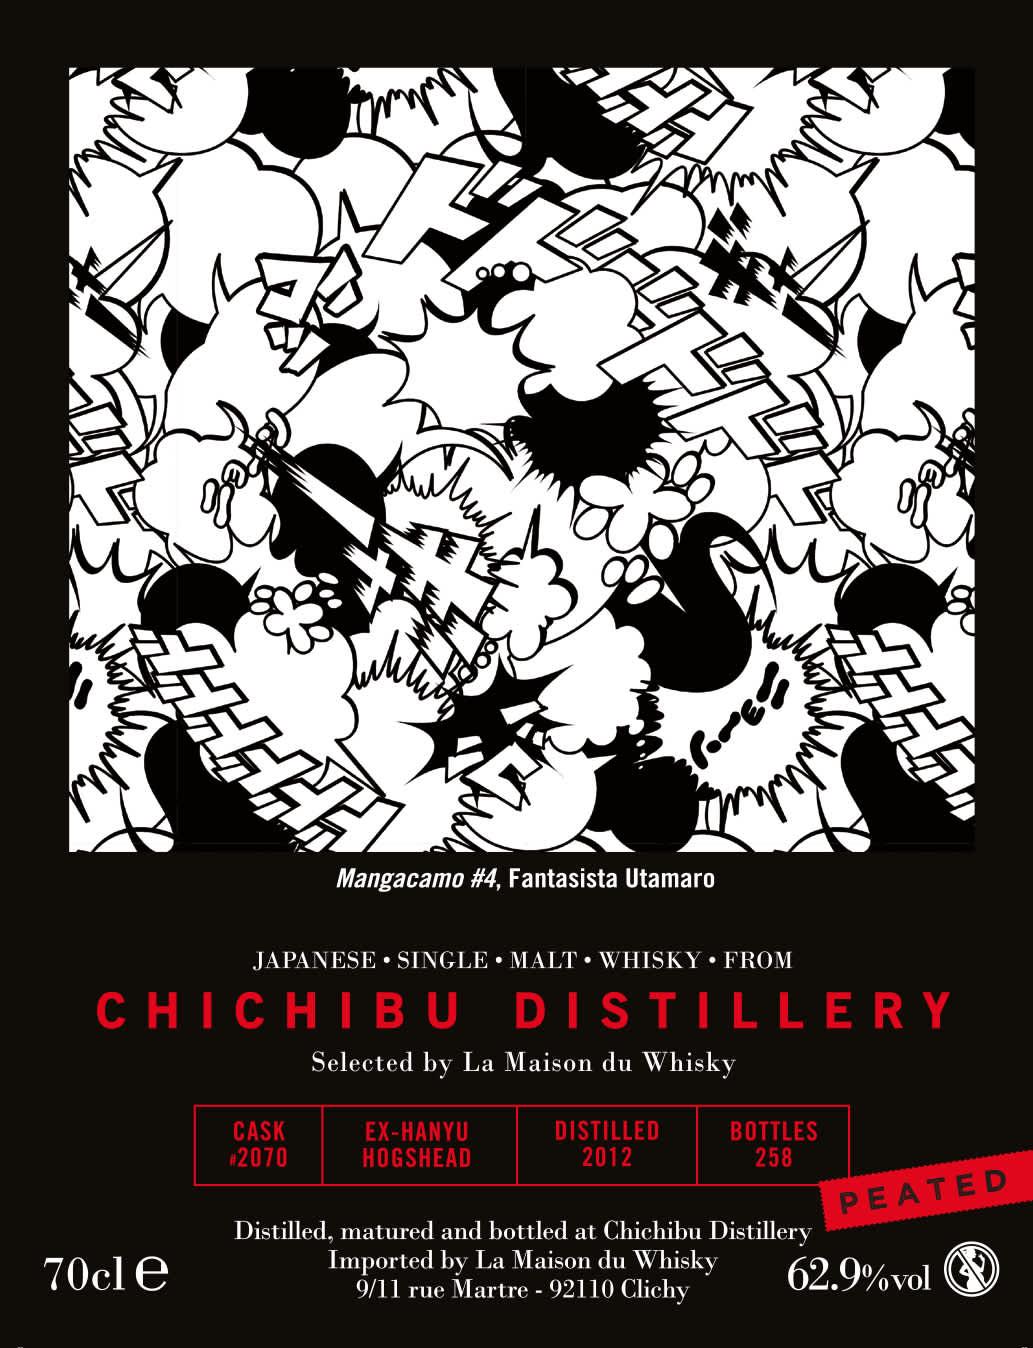 chichibu distillery - la maison du whisky - fantasista utamaro - label layout - sato creative - paris - tokyo